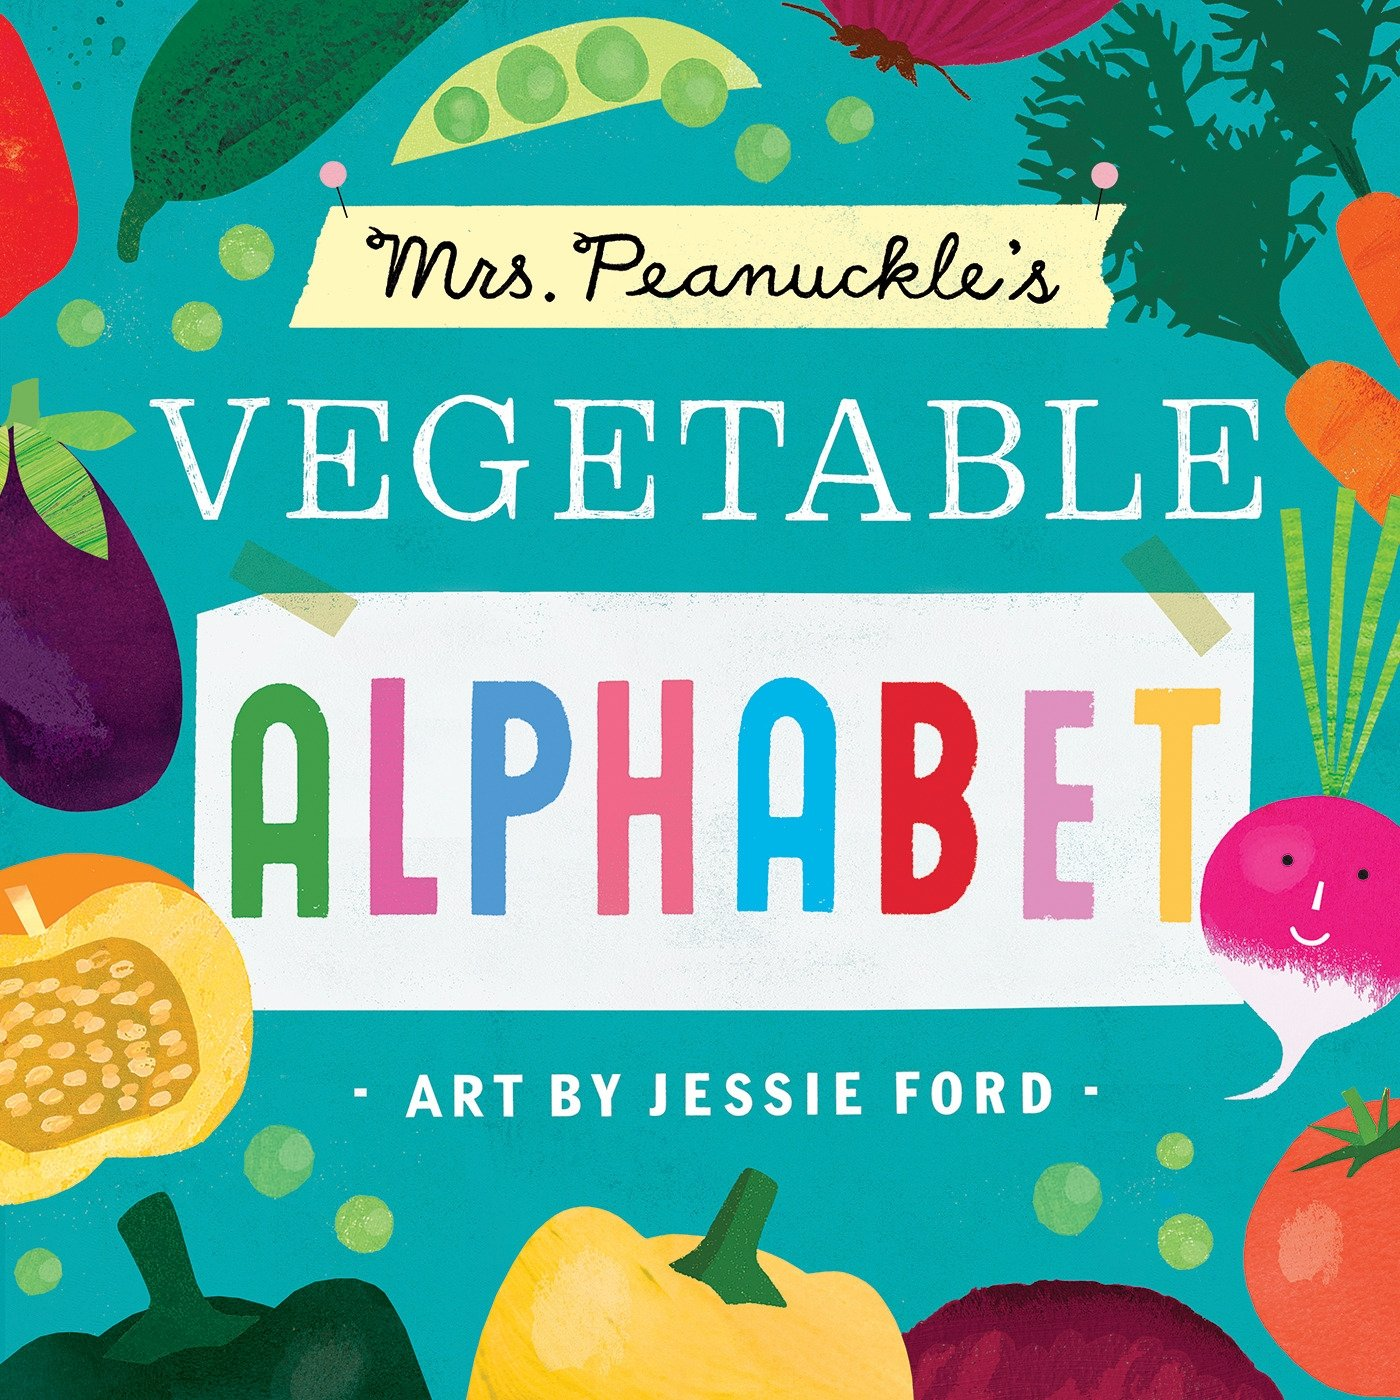 Mrs. Peanuckle's Vegetable Alphabet (Mrs. Peanuckle's Alphabet)